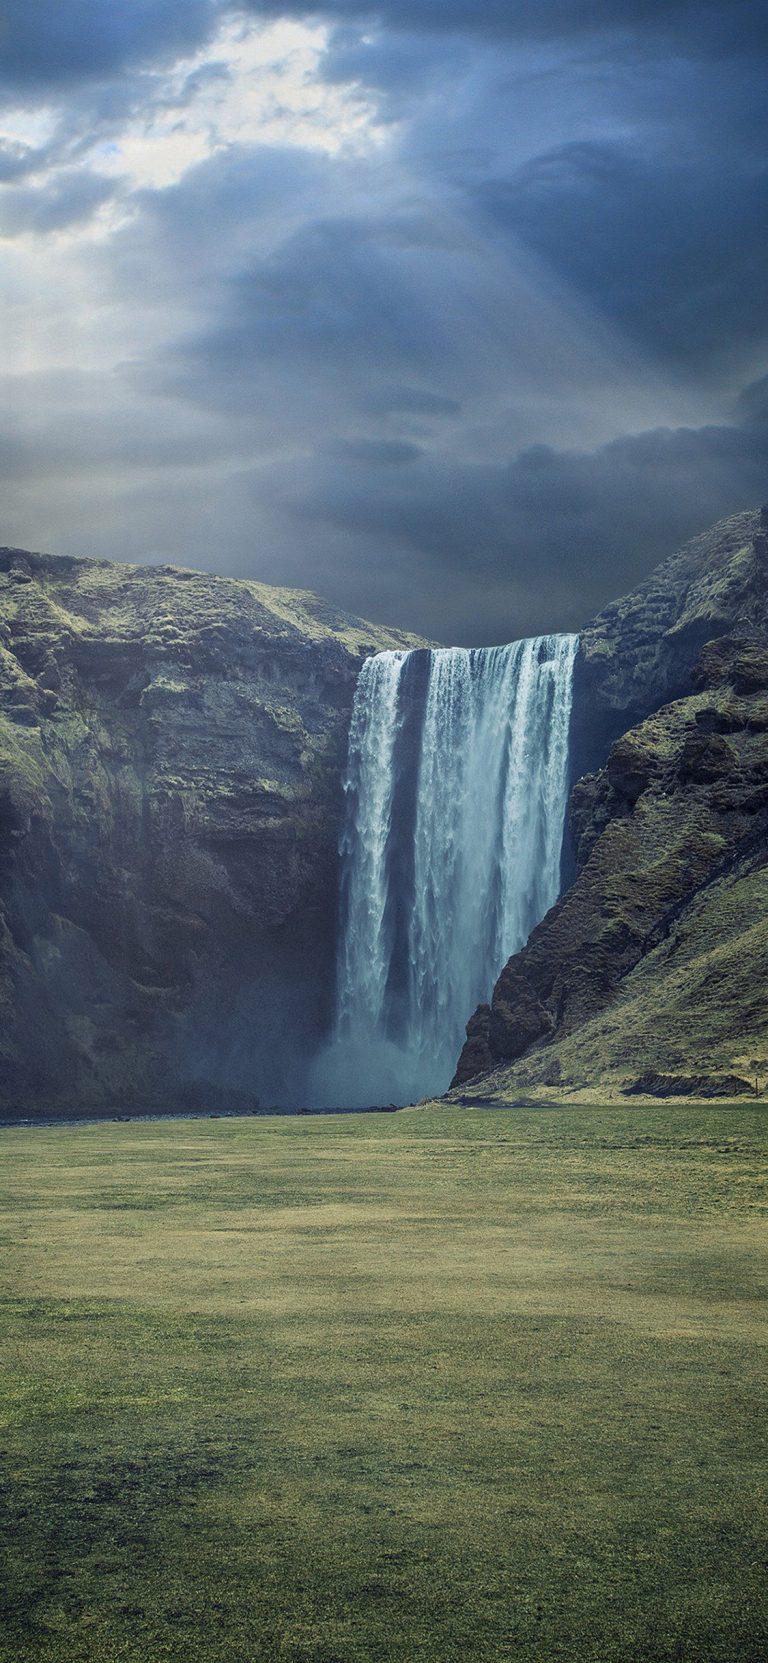 Waterfall Landscape HD Wallpaper 1125x2436 768x1663